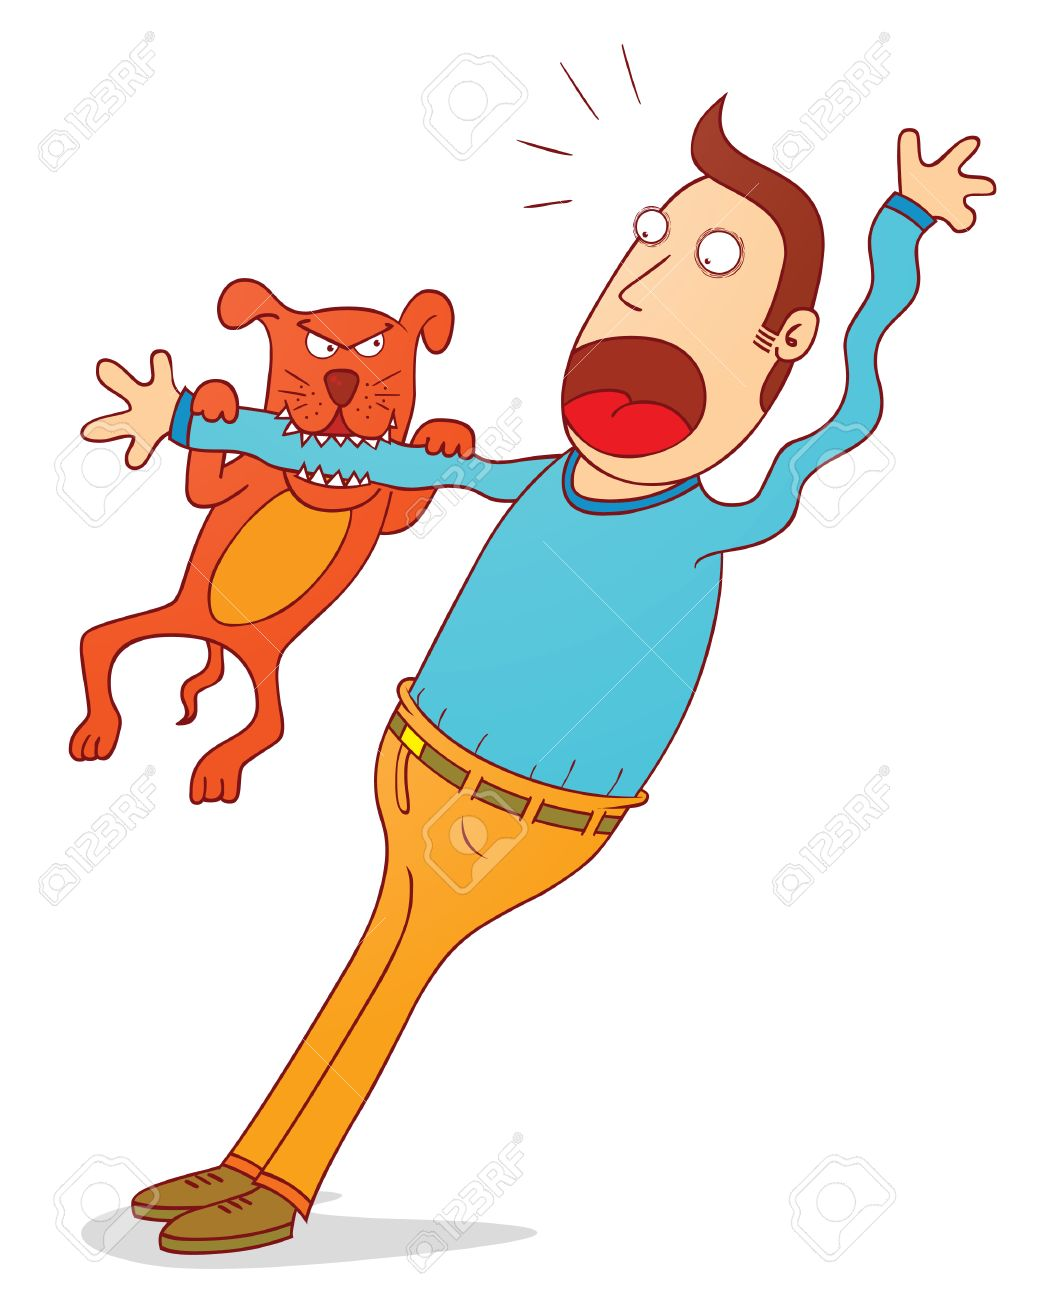 1057x1300 839 Bad Dog Stock Vector Illustration And Royalty Free Bad Dog Clipart